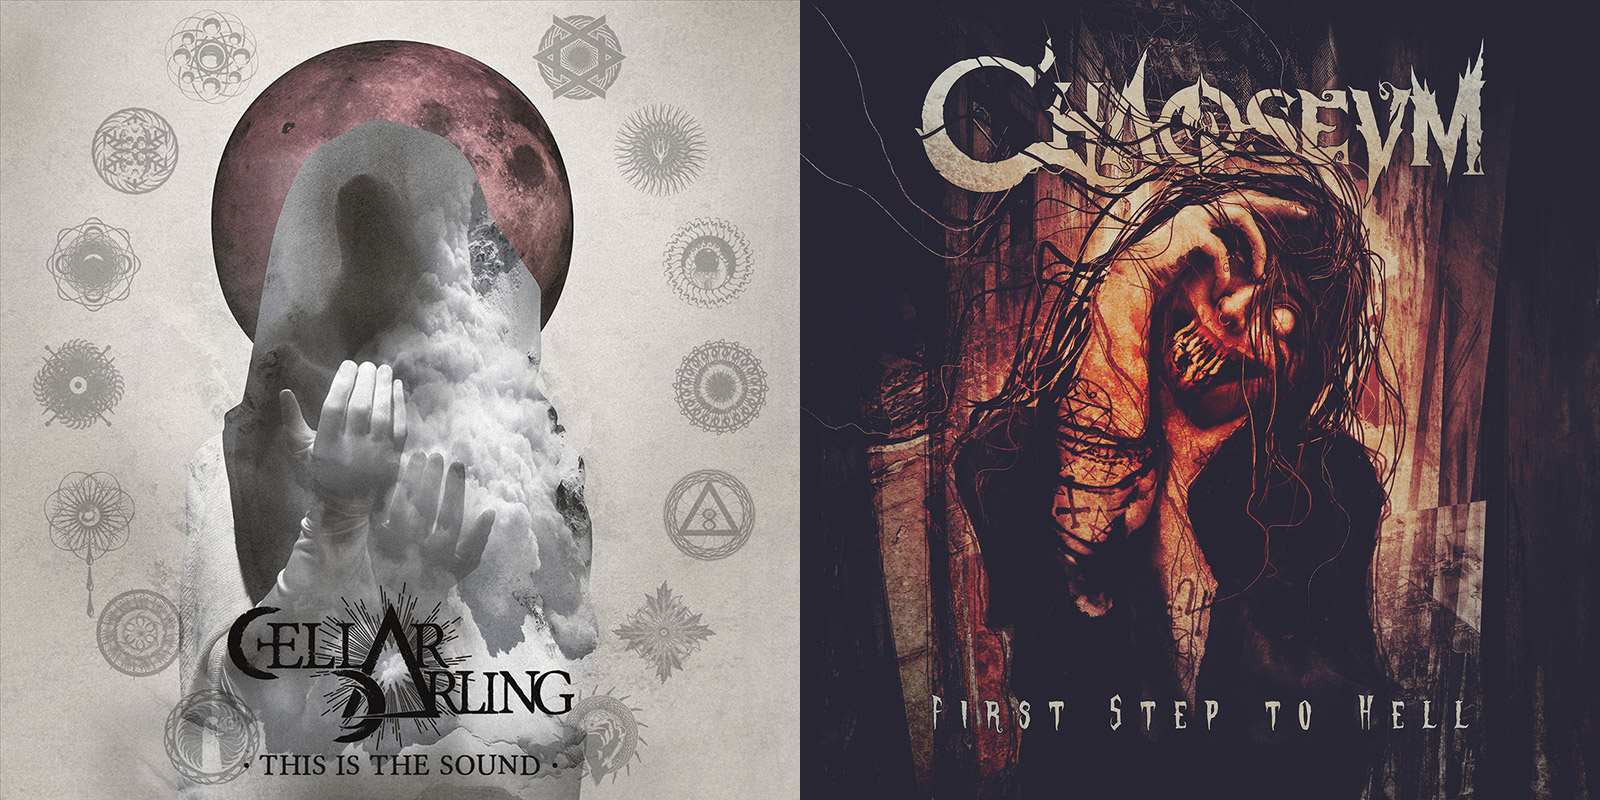 Cellar Darling / Chaoseum